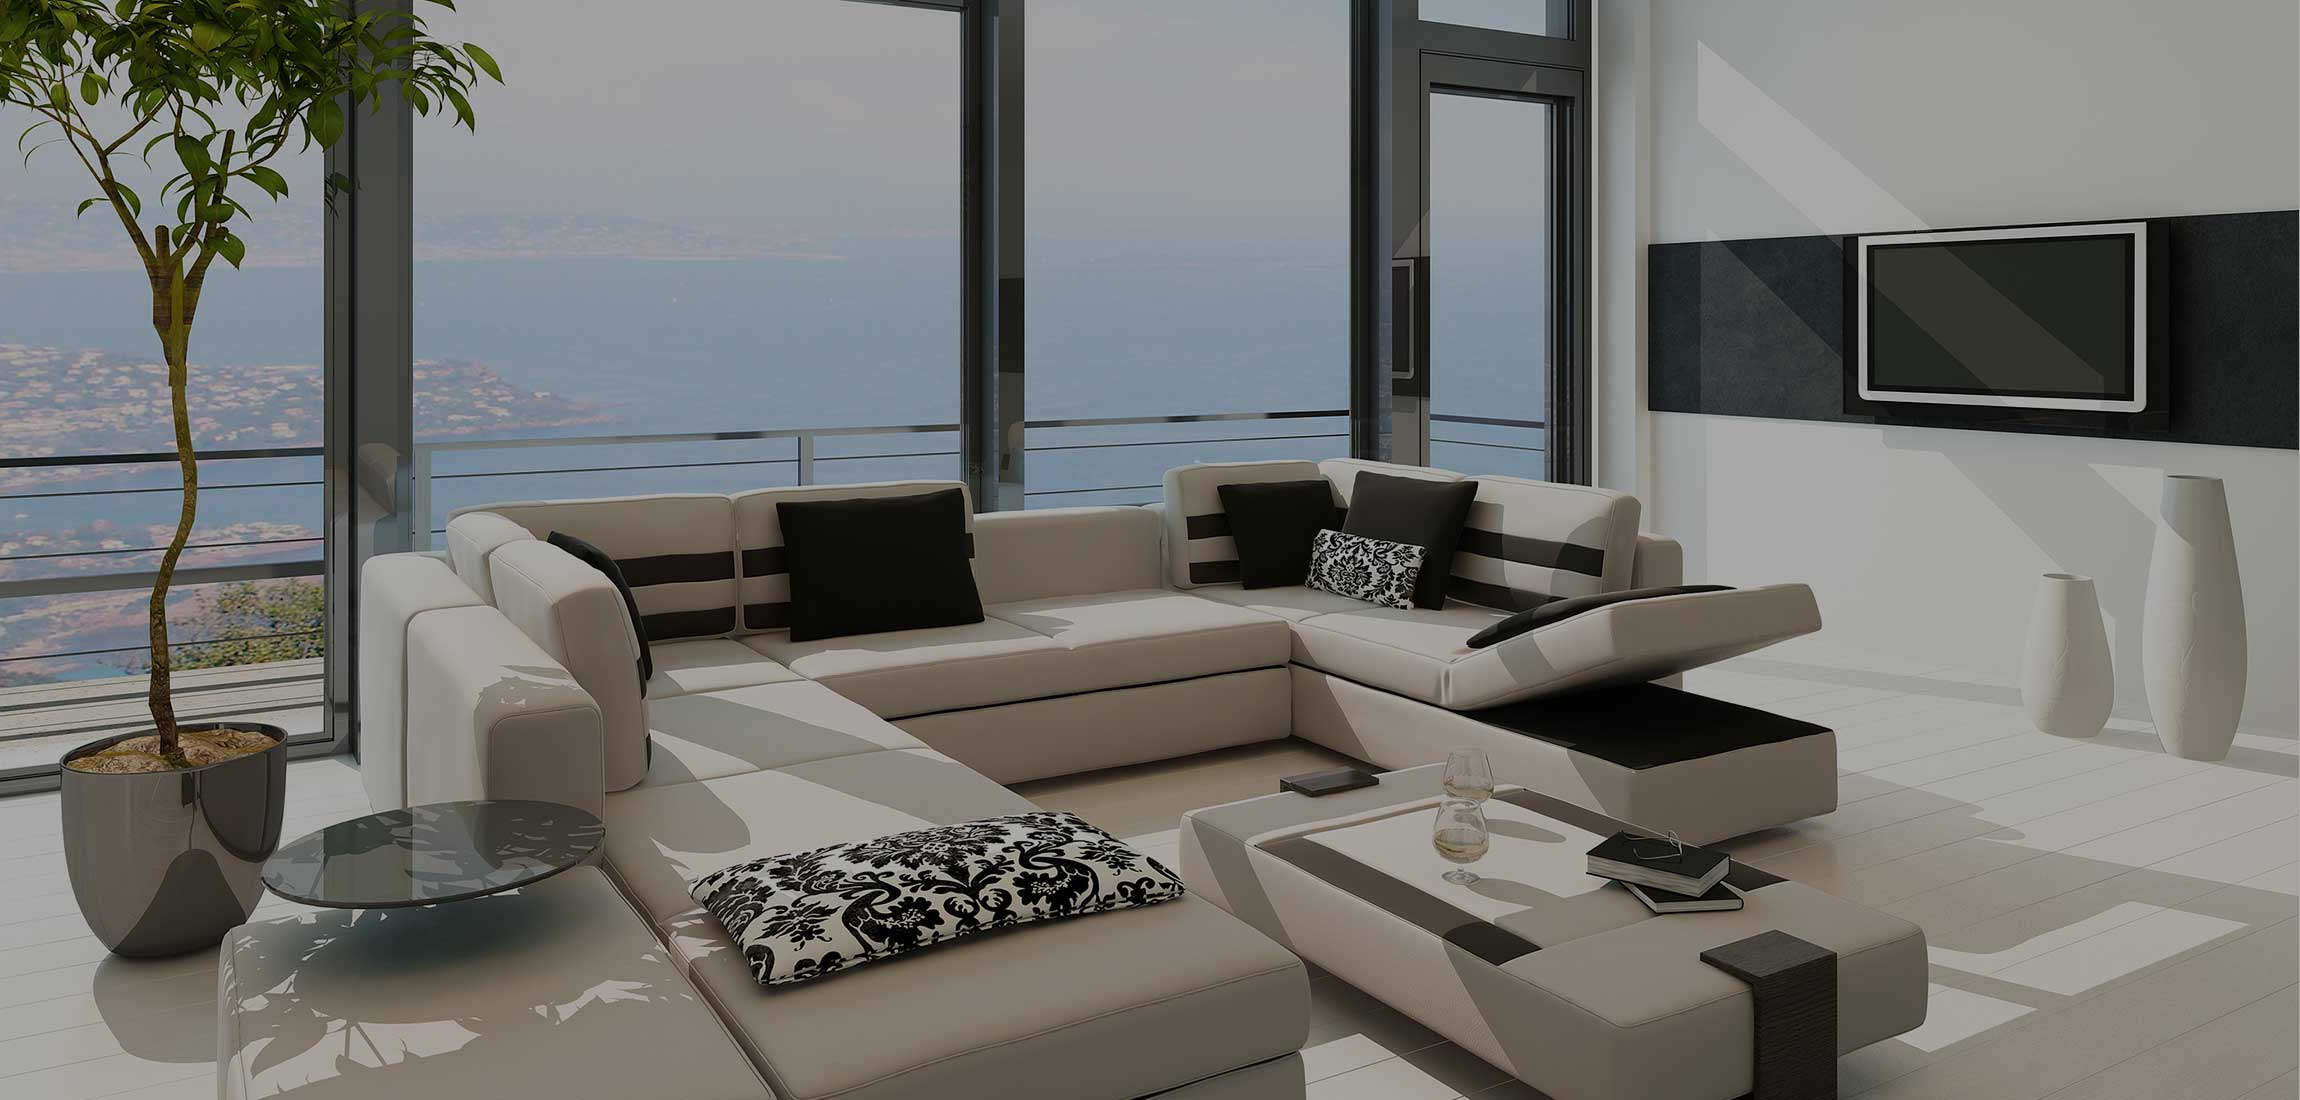 future-hotel-room